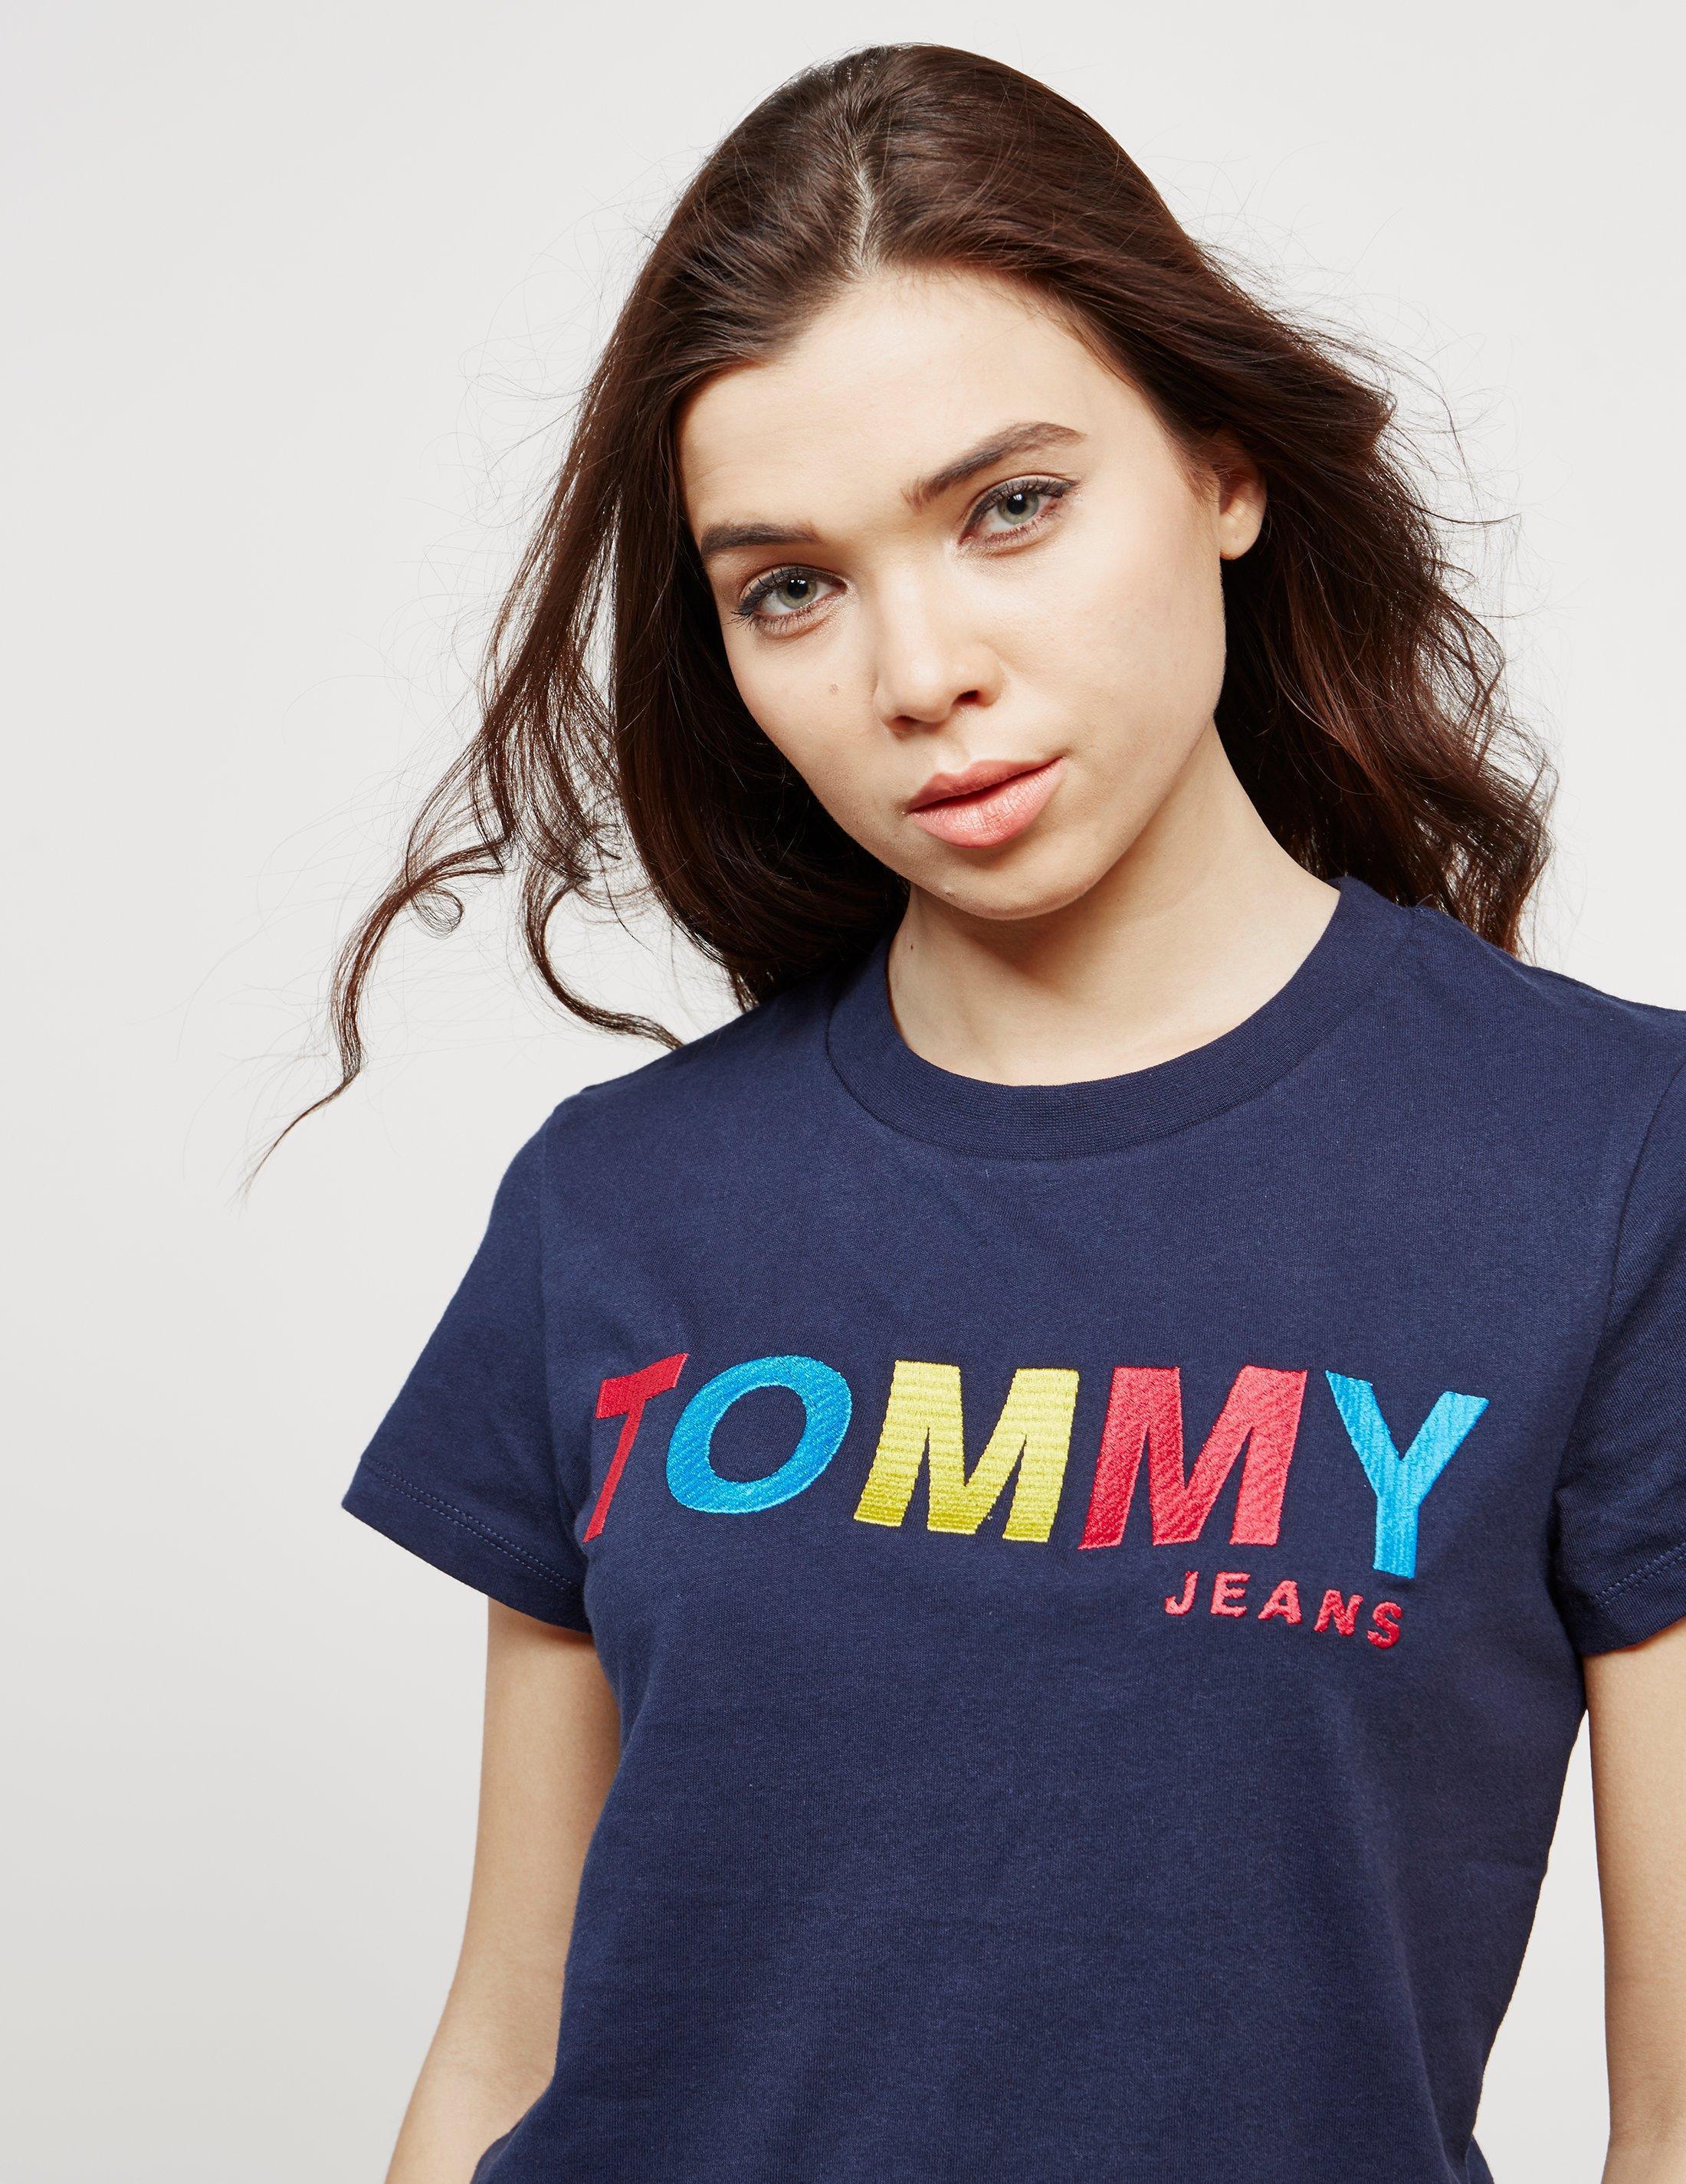 129825f50b96 Tommy Hilfiger Logo Short Sleeve T-shirt Navy Blue in Blue - Lyst